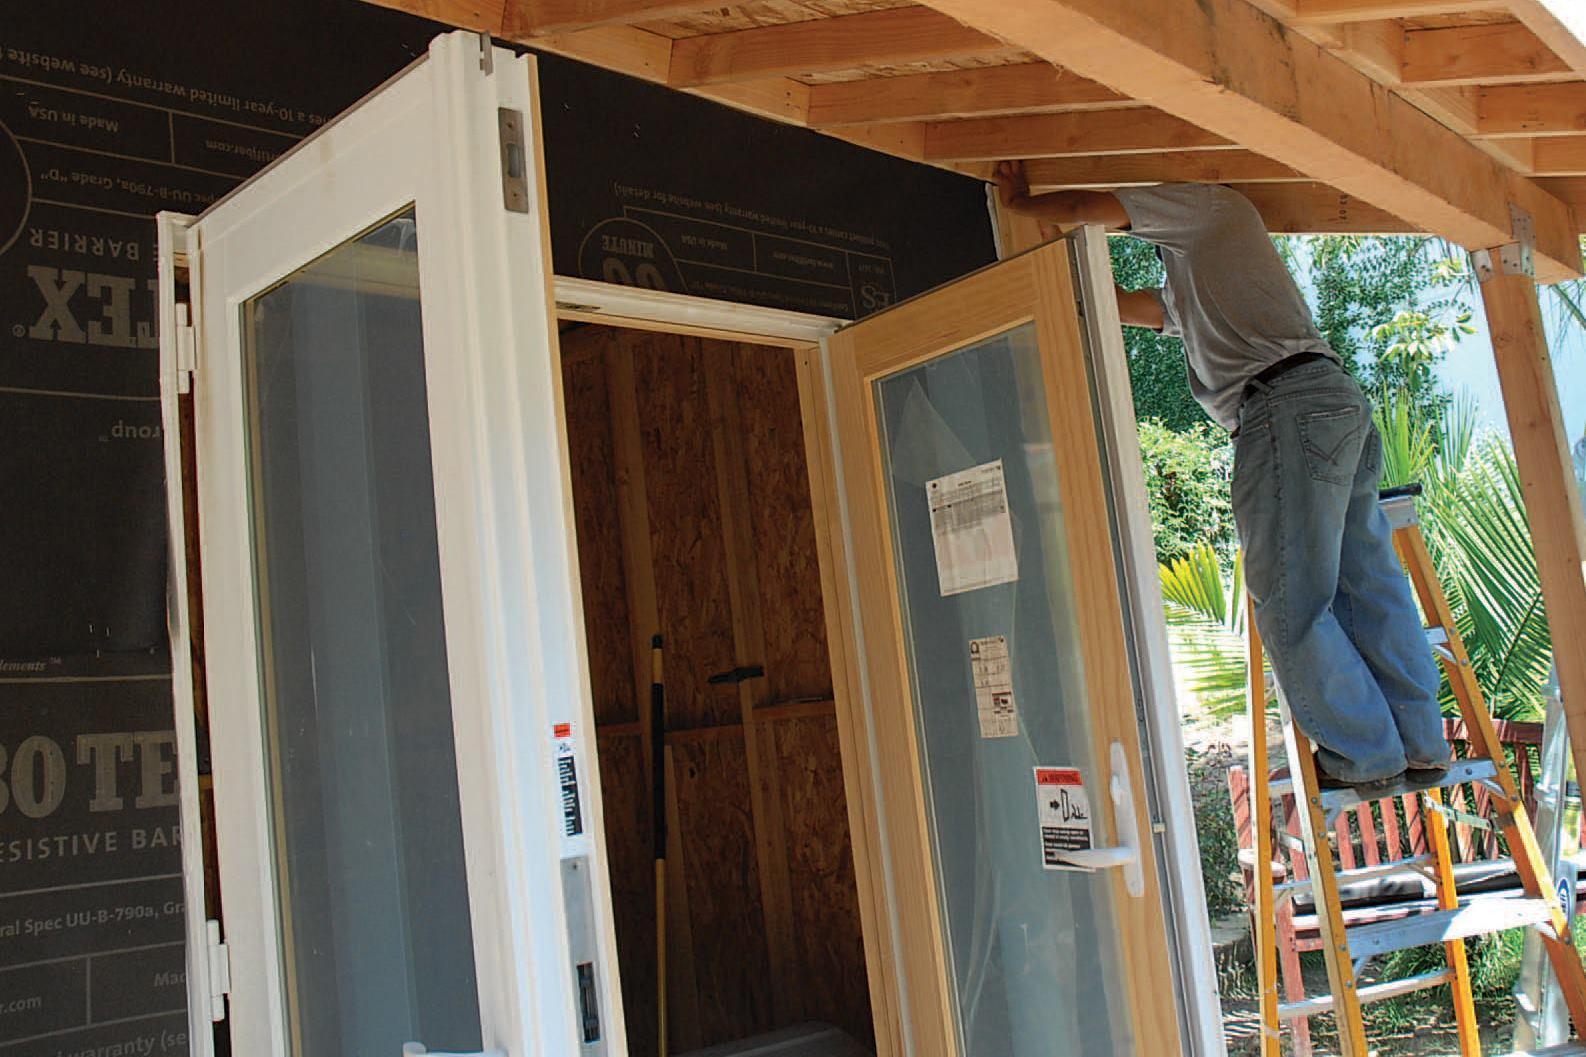 Installing french doors jlc online doors installation - How to hang interior french doors ...